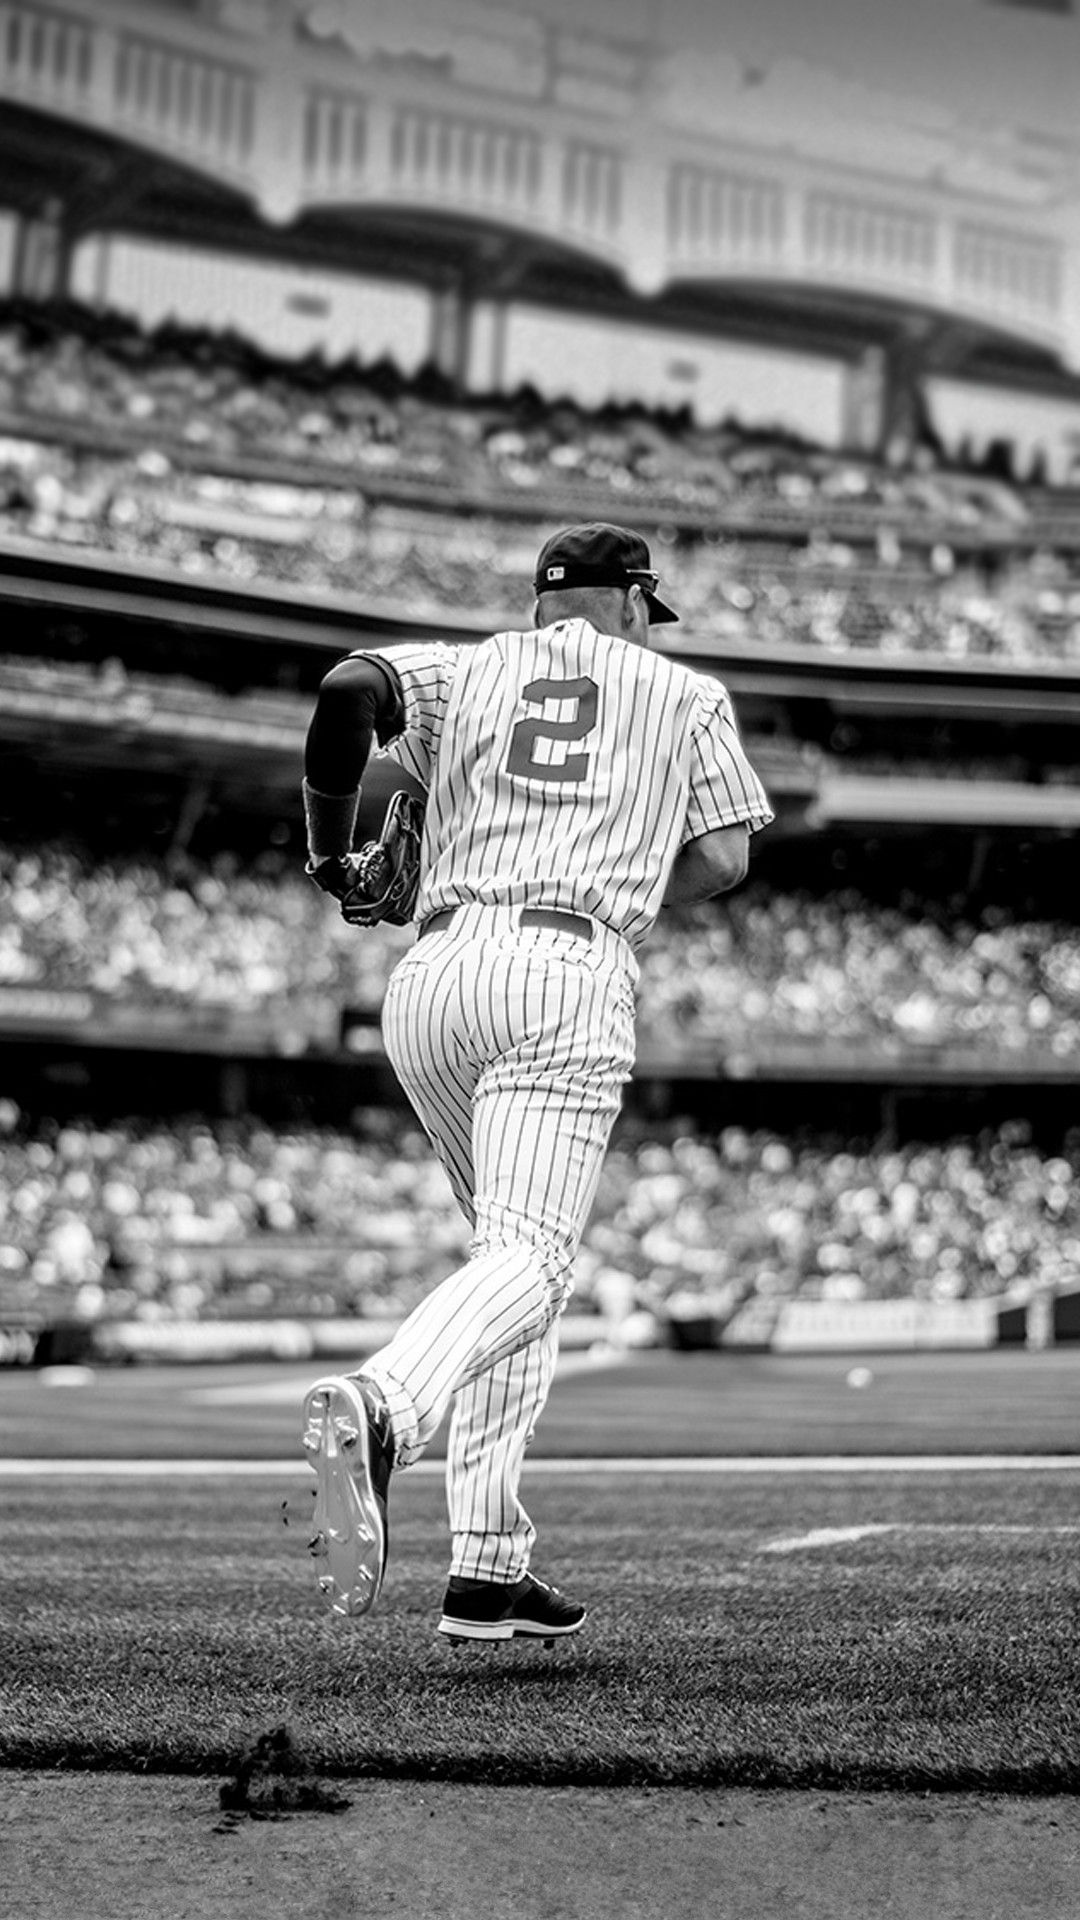 Yankees Iphone 7 Plus Wallpaper Derek Jeter Wallpapers 183 ①